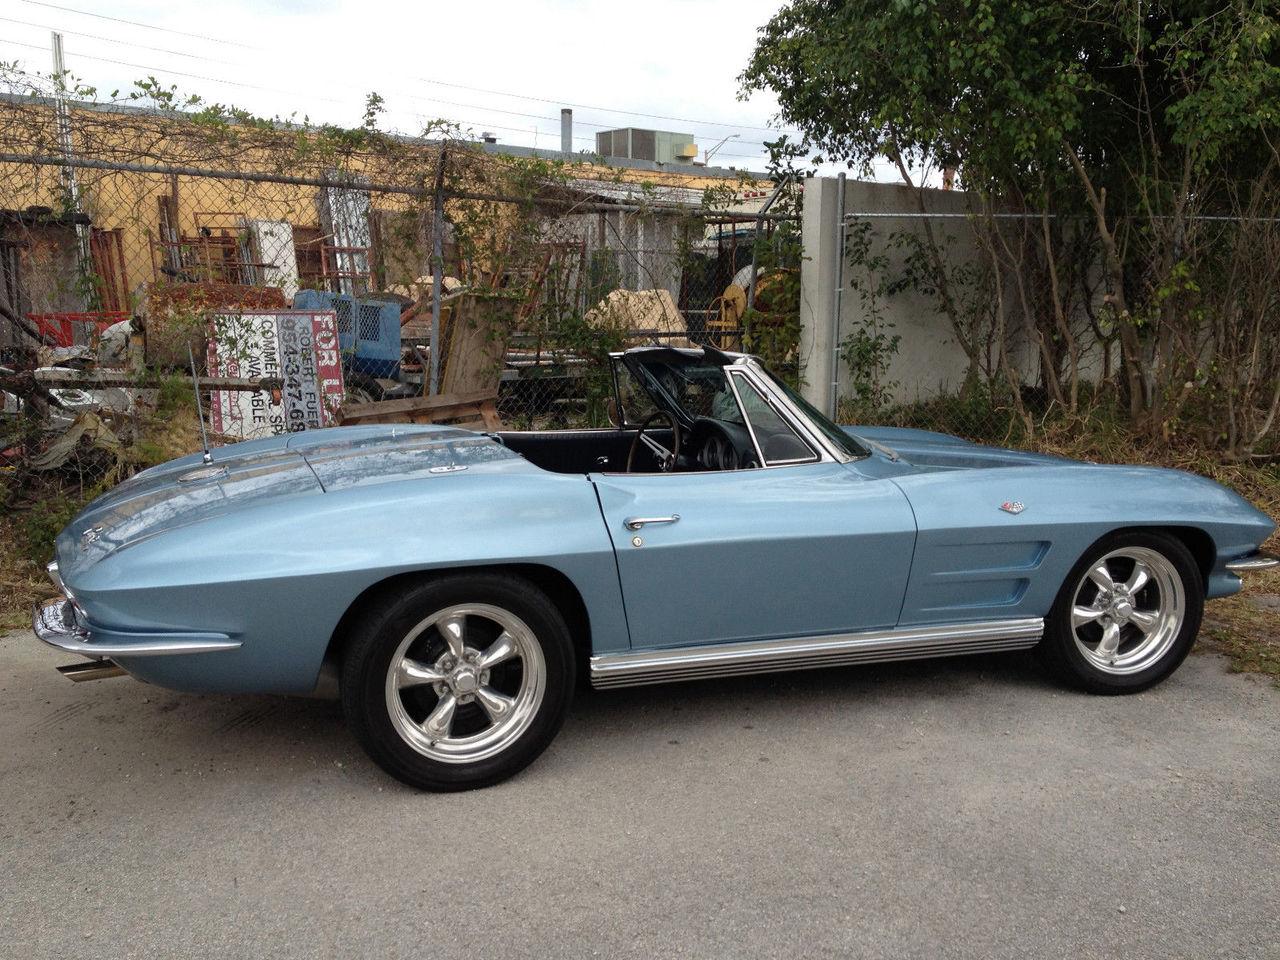 gallery midyear monday 31 corvette photos corvette sales news lifestyle. Black Bedroom Furniture Sets. Home Design Ideas